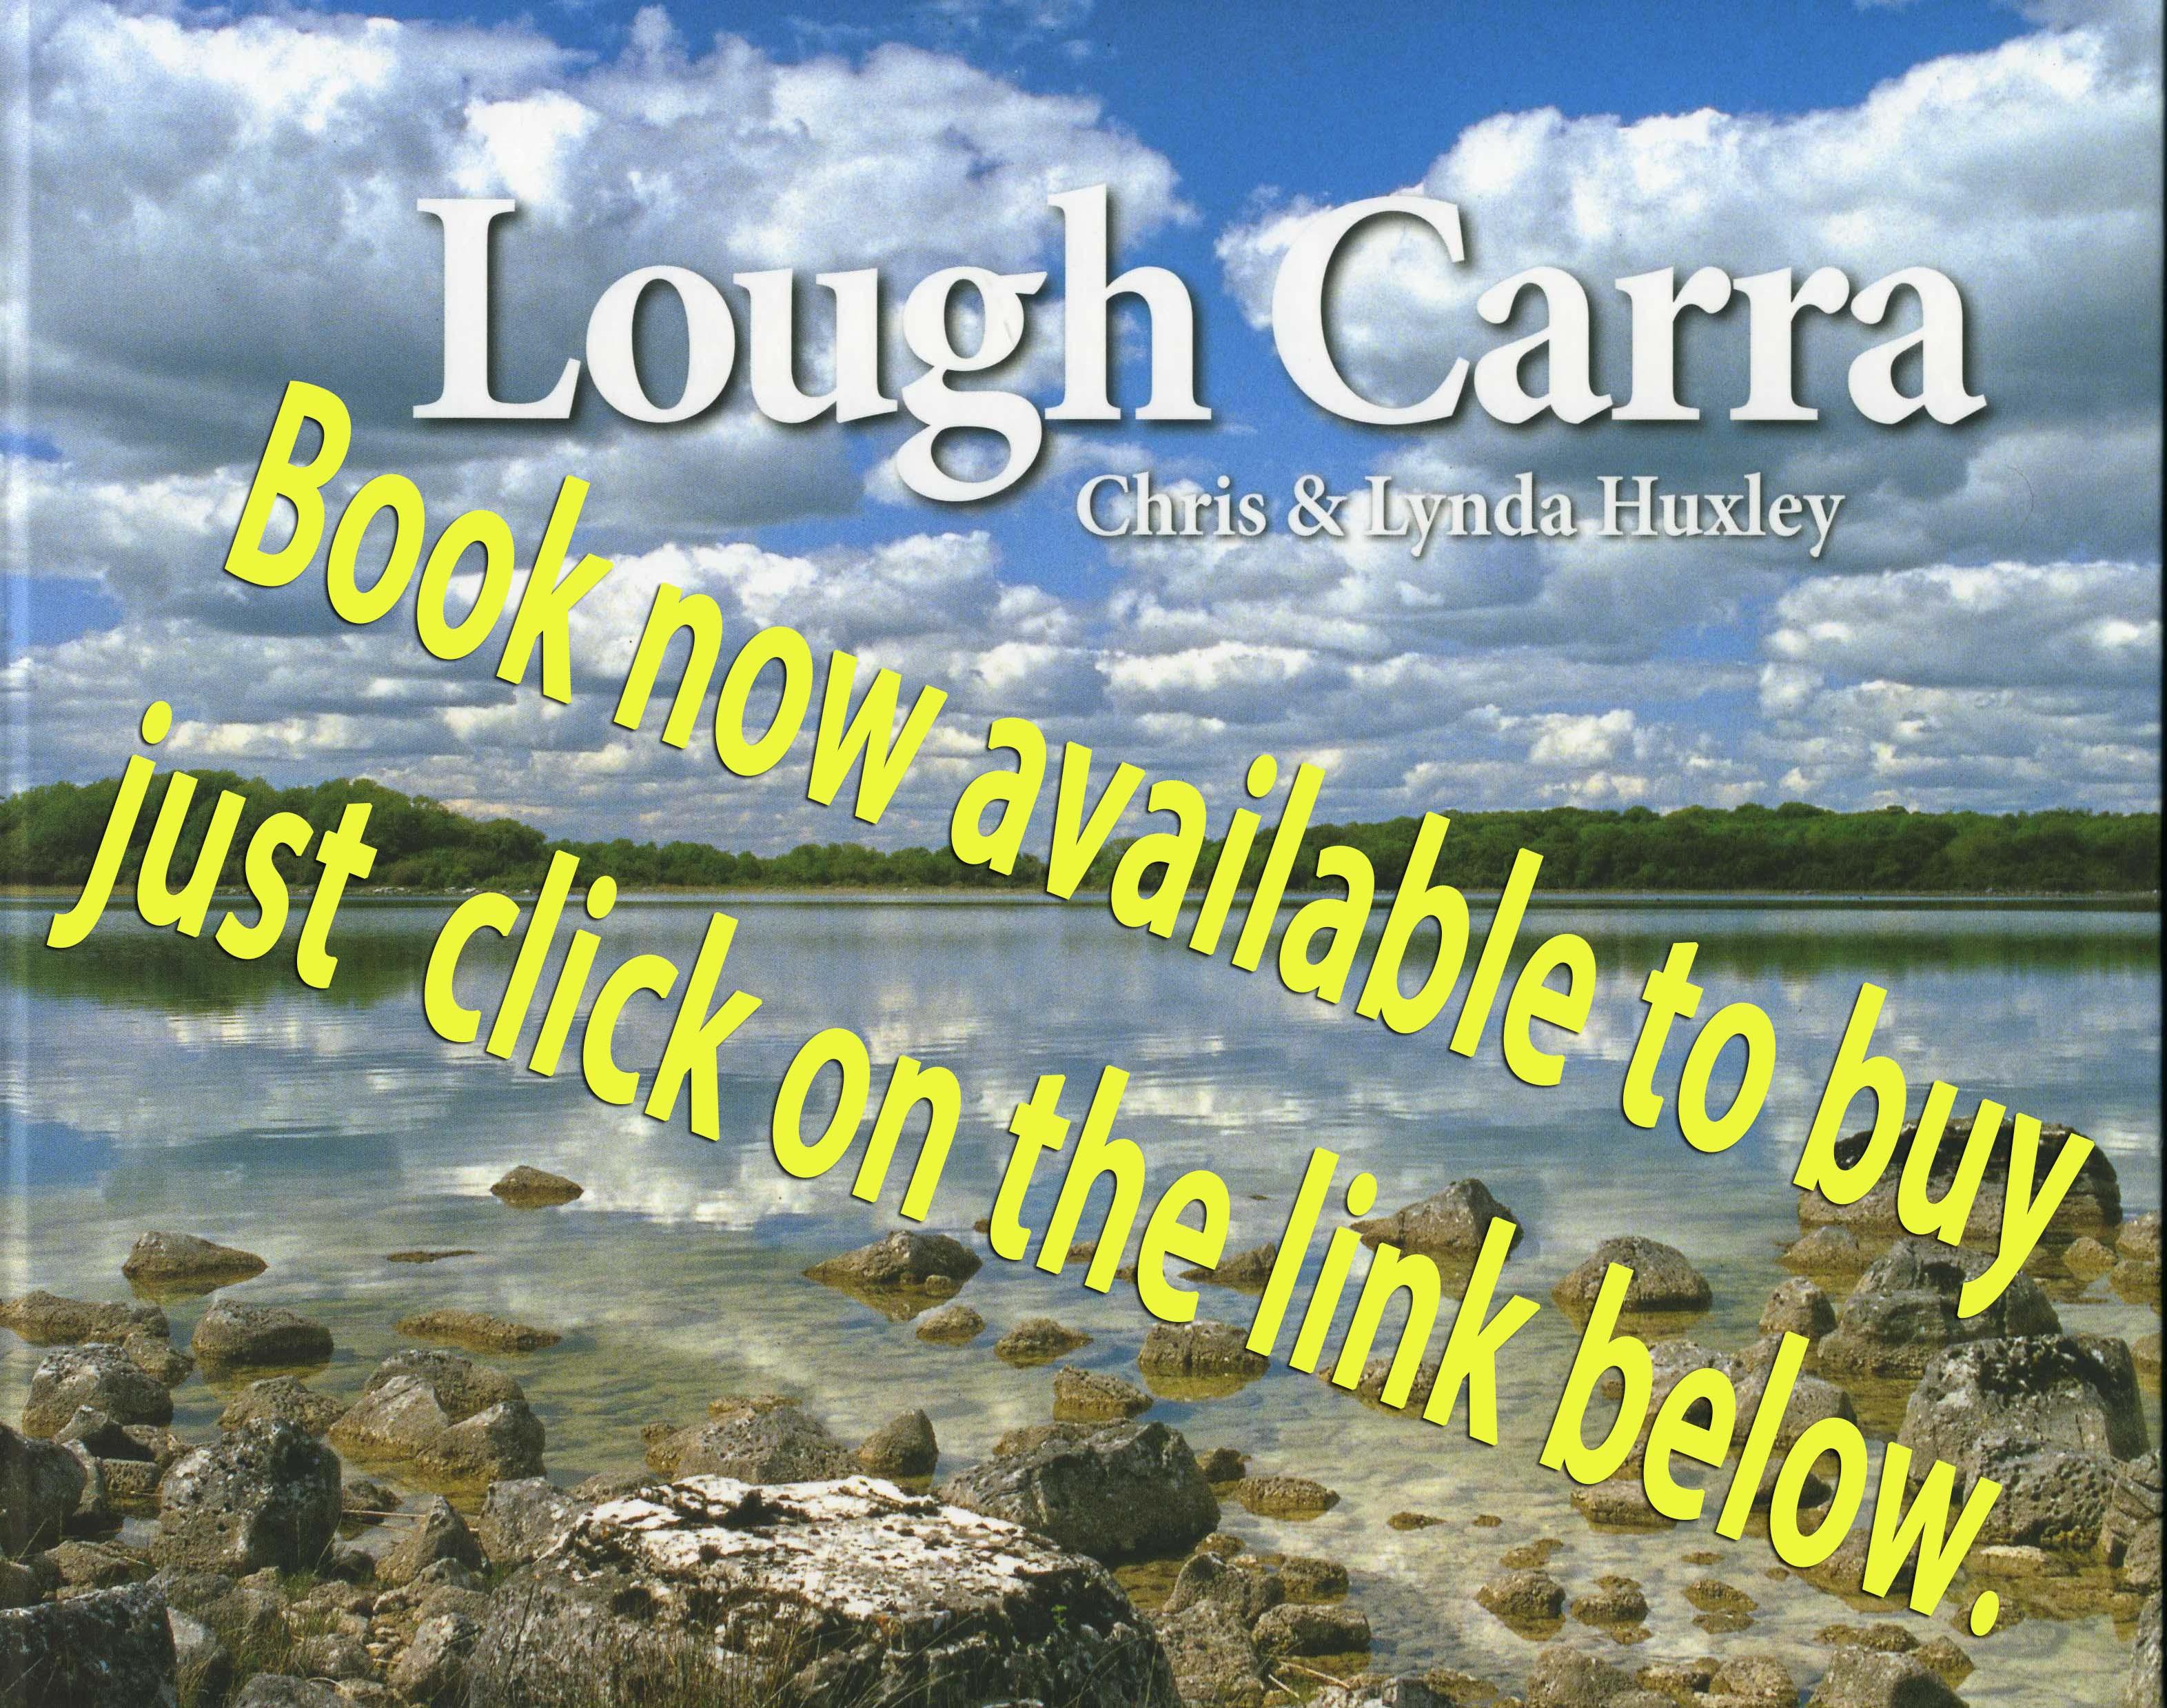 Lough Carra Book written by Chris and Lynda HuxleyLough Carra Book